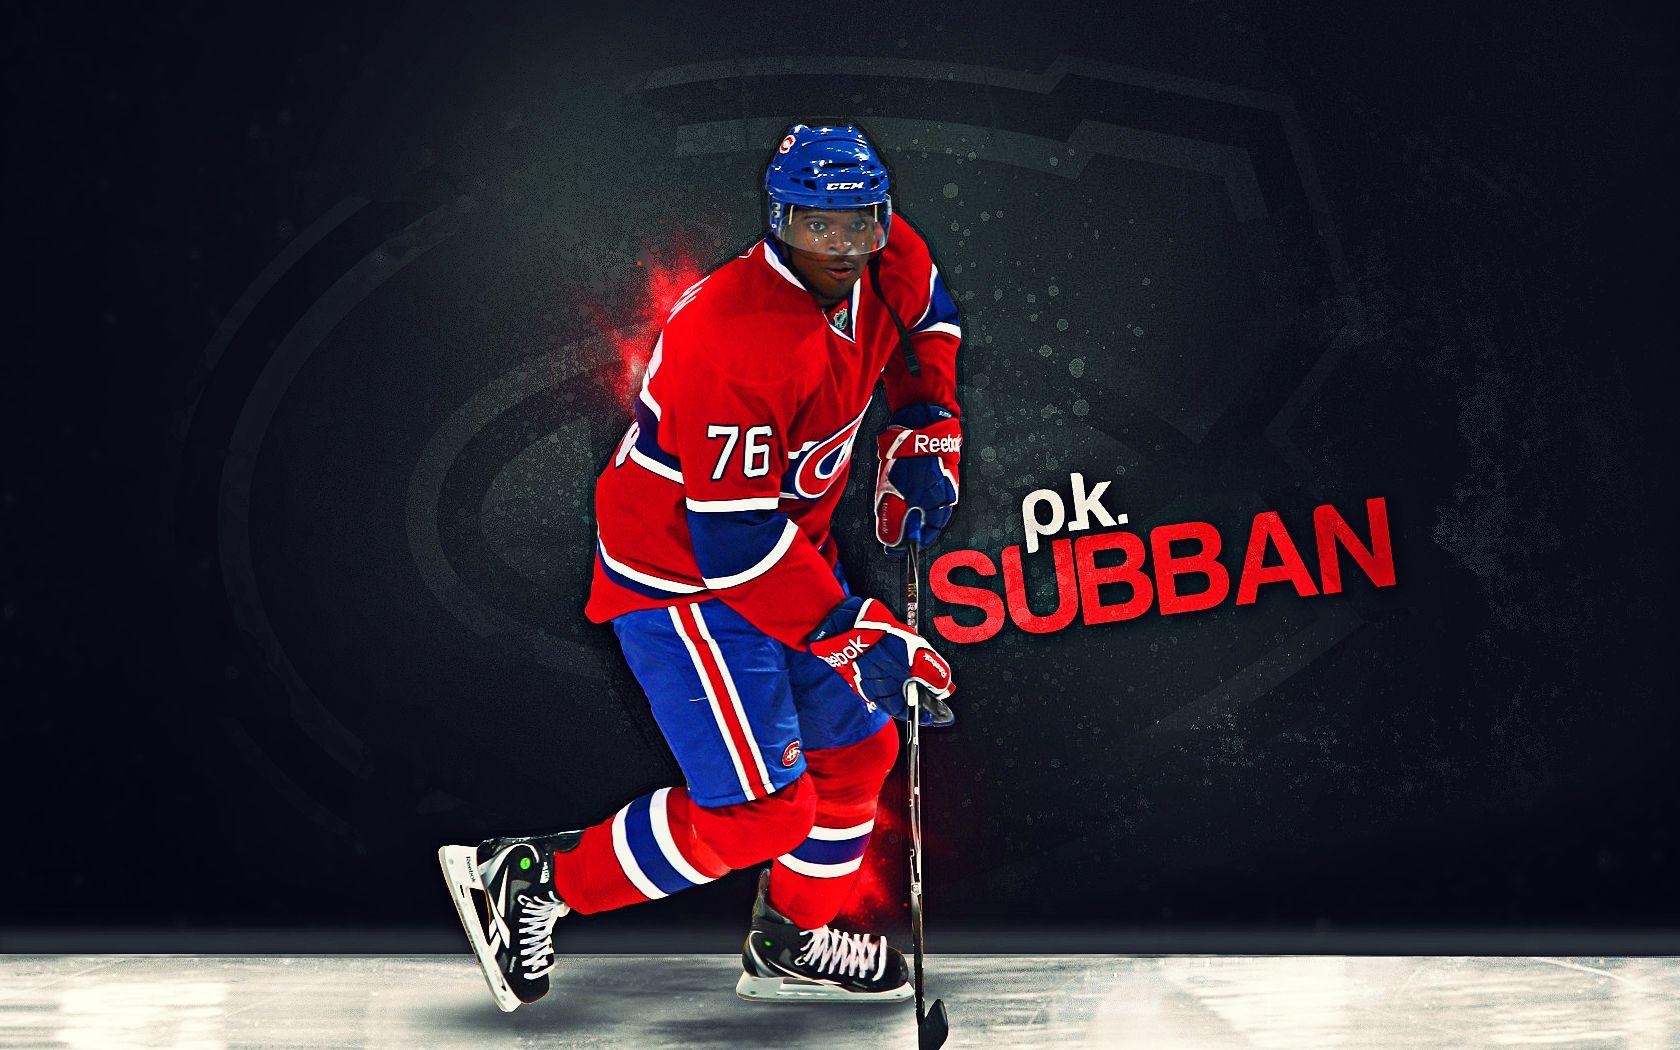 Carey price wallpapers montreal habs montreal hockey 9 html code - P K Subban Wallpaper Montreal Hockey Canadiens 6 Free Hd